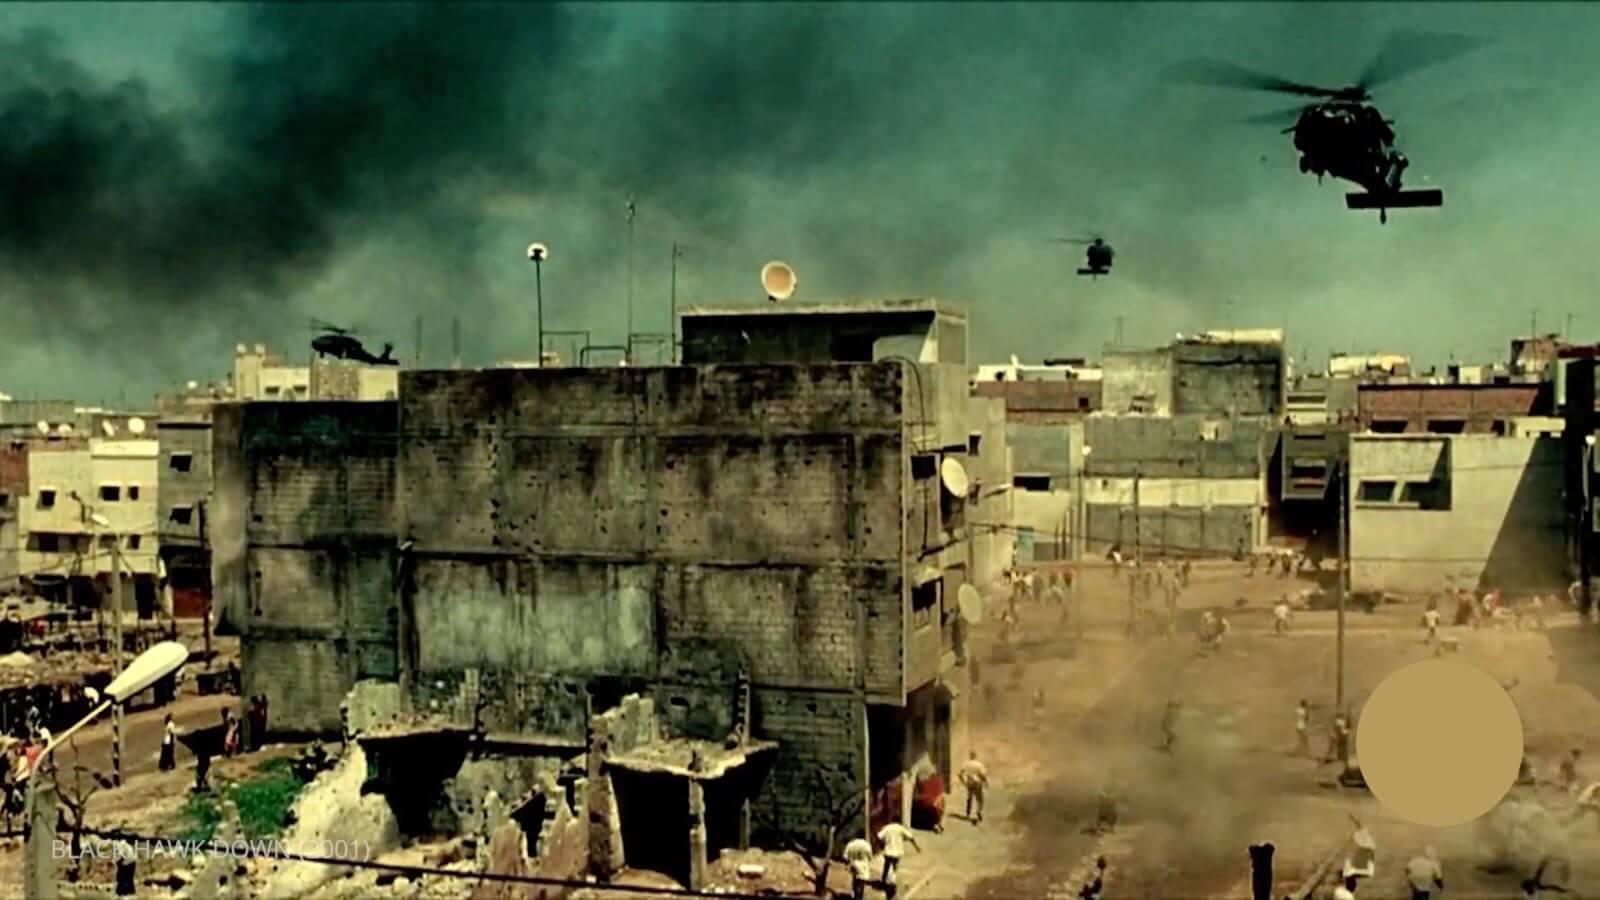 Ridley Scott Movie Color Palette - Black Hawk Down Helicopter